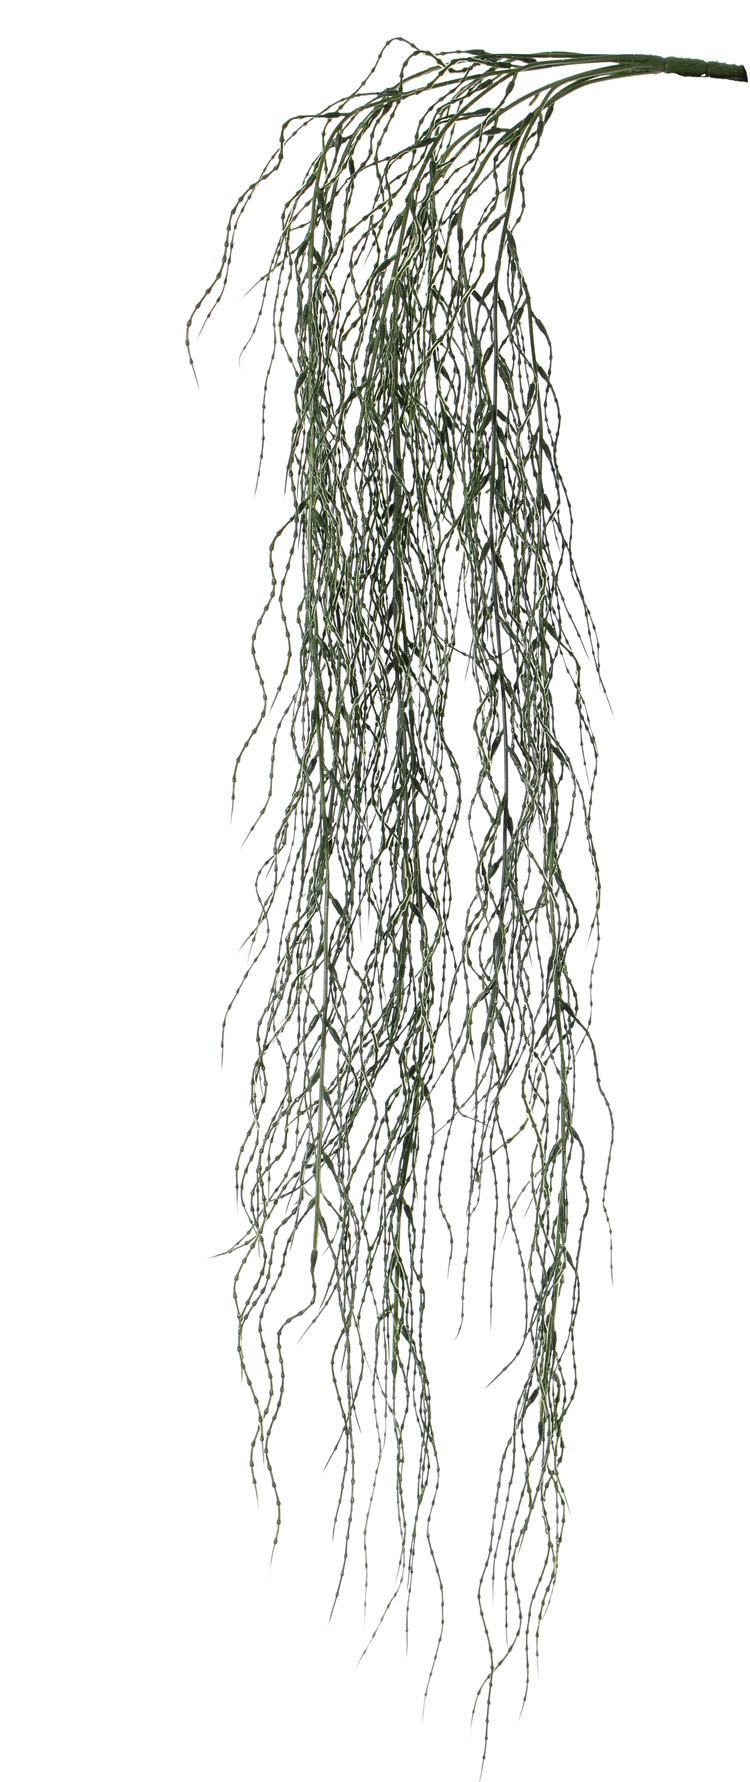 colgante de Sauce llorón (Salix) x9, plástico, 95cm